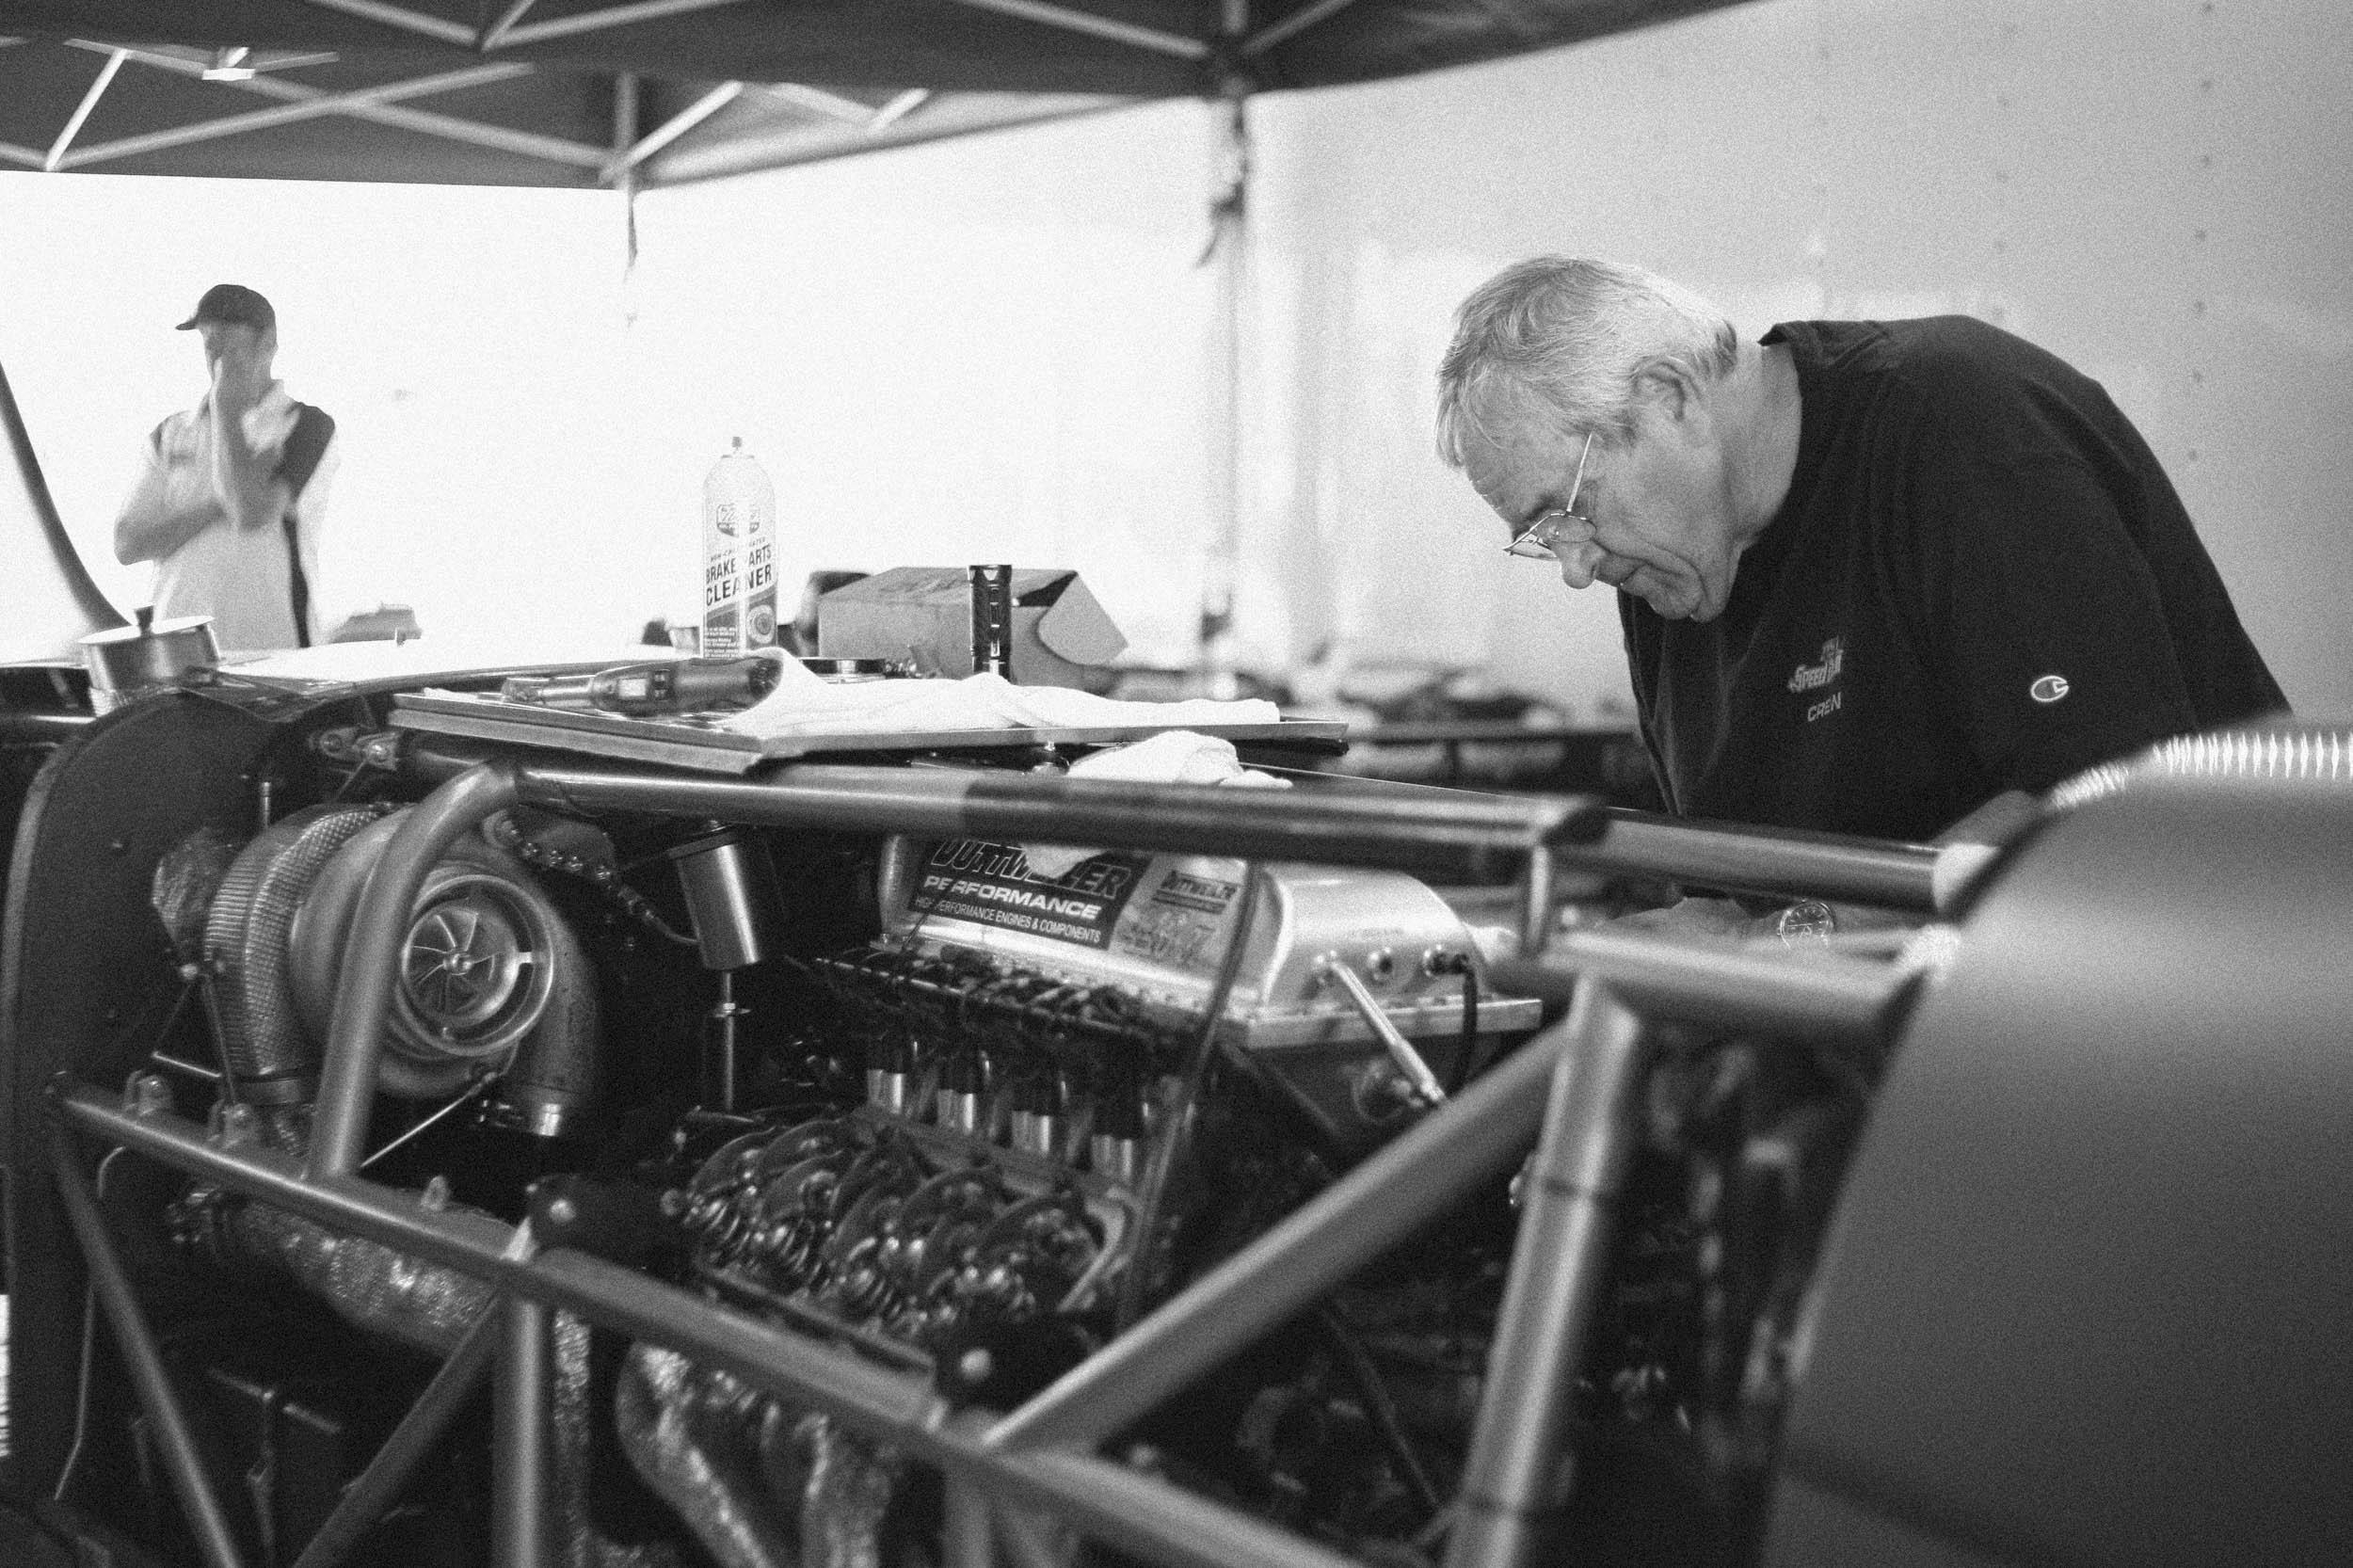 Kenny Duttweiler built the 443-cubic-inch Chevrolet LS V-8 that produces 2600 horsepower.